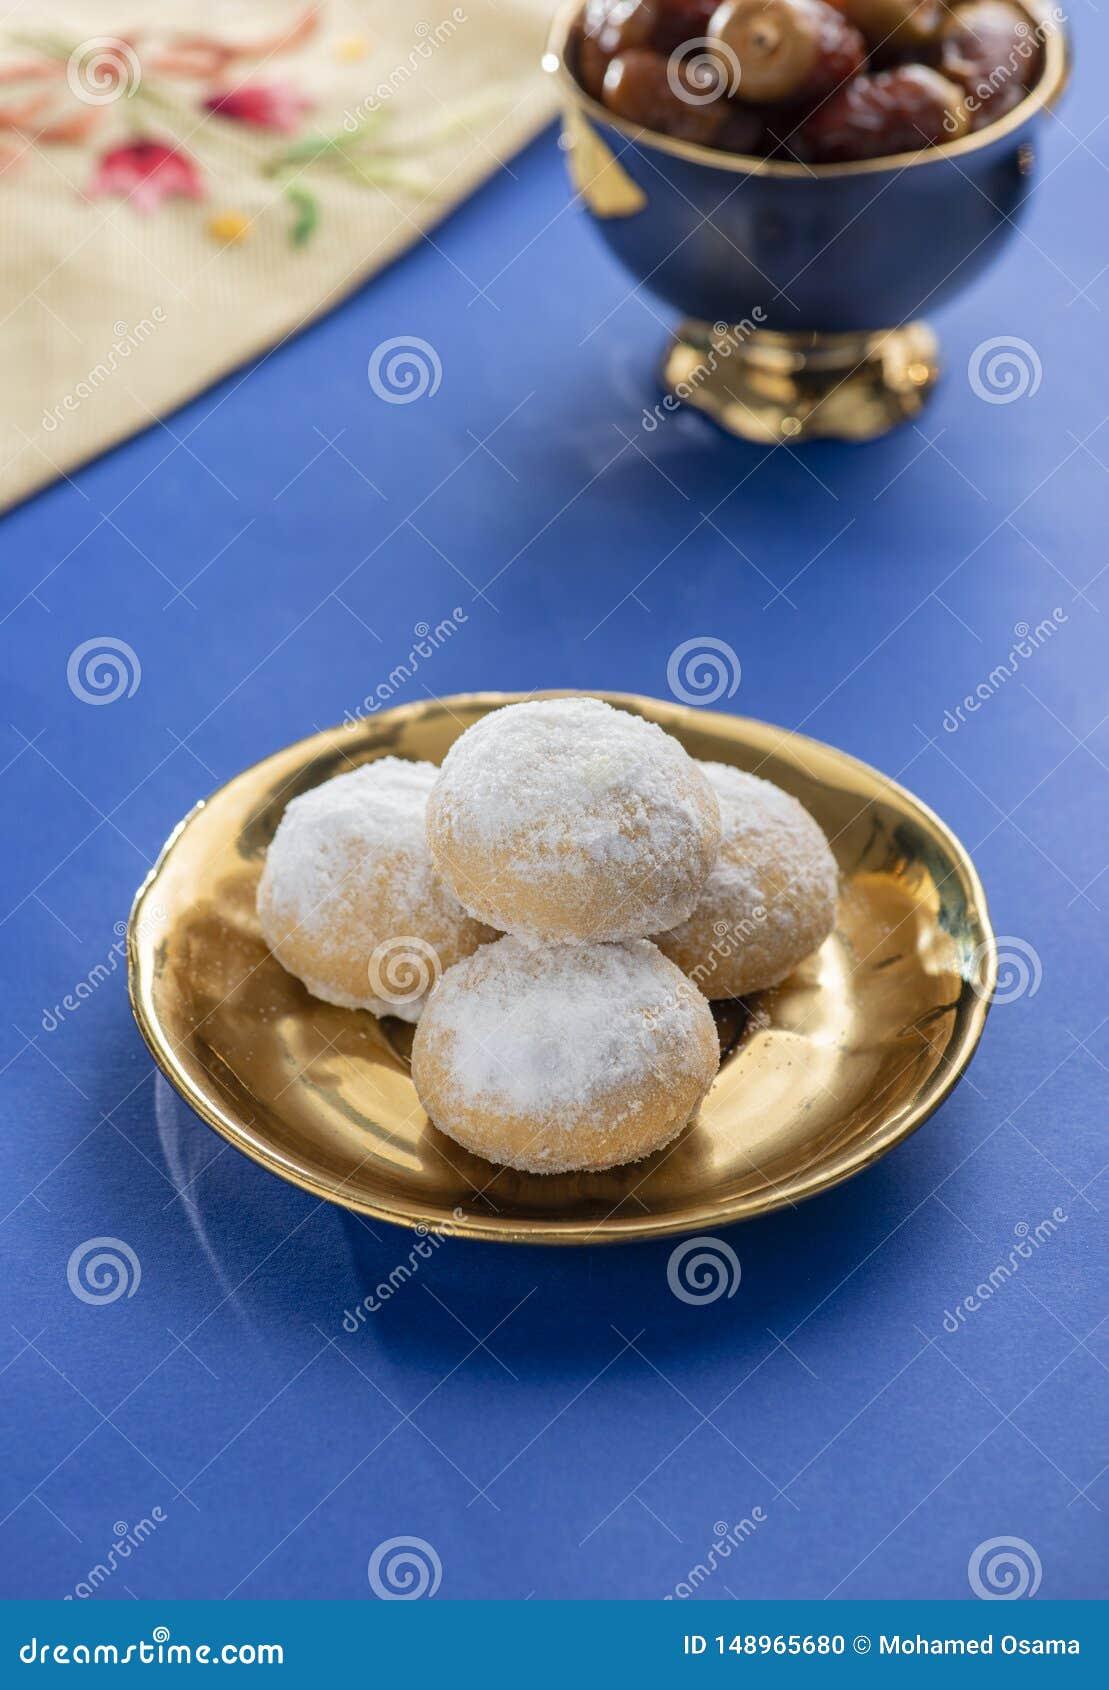 Sweet Eid El Fitr Cookies Dish, Muslim Lesser Holiday Traditional Sweets